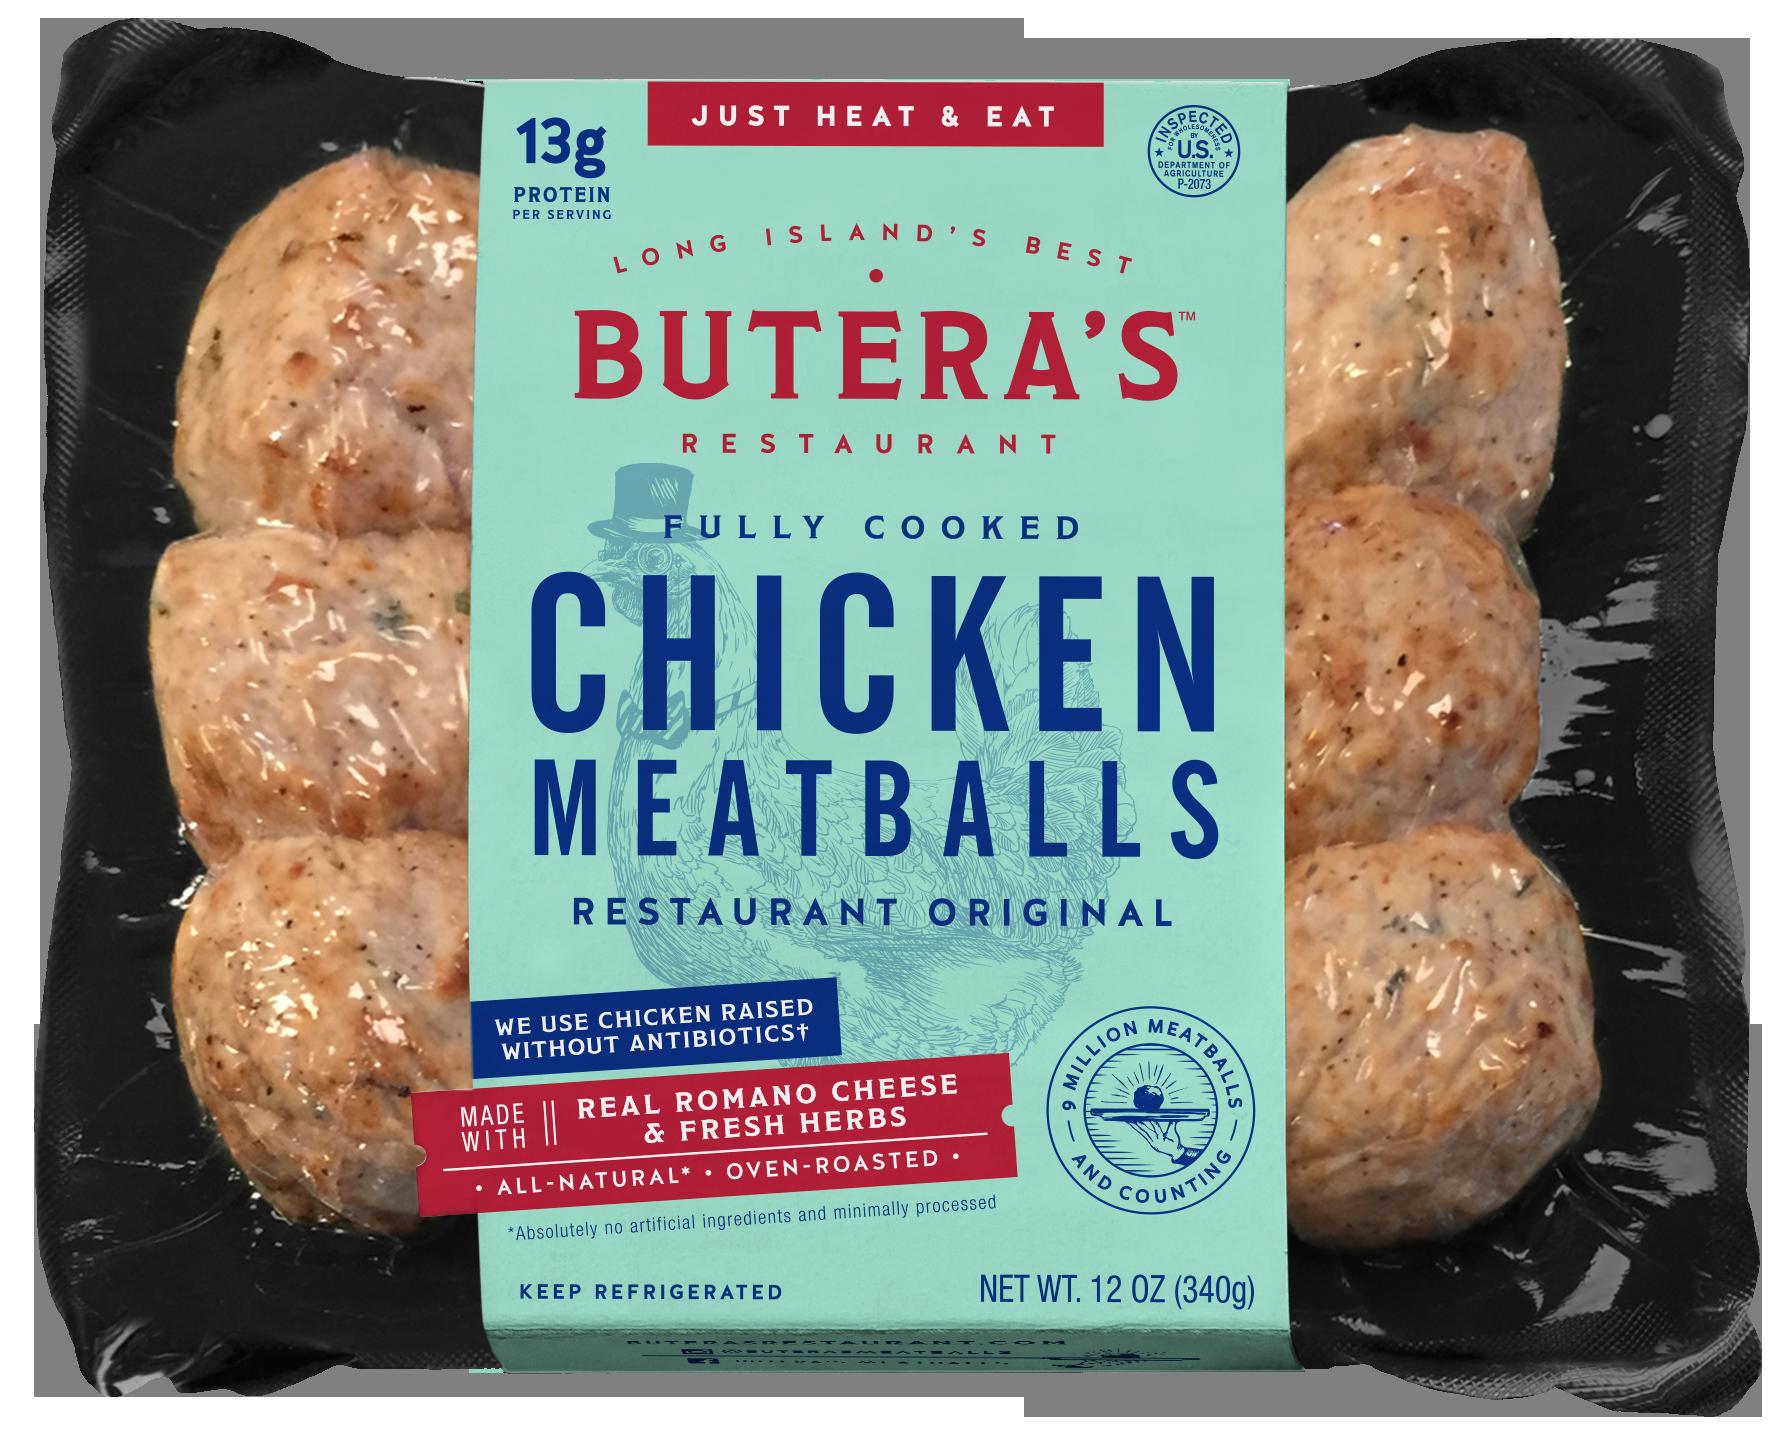 Buteras_Meatball_Packaging_Mockup_3.png